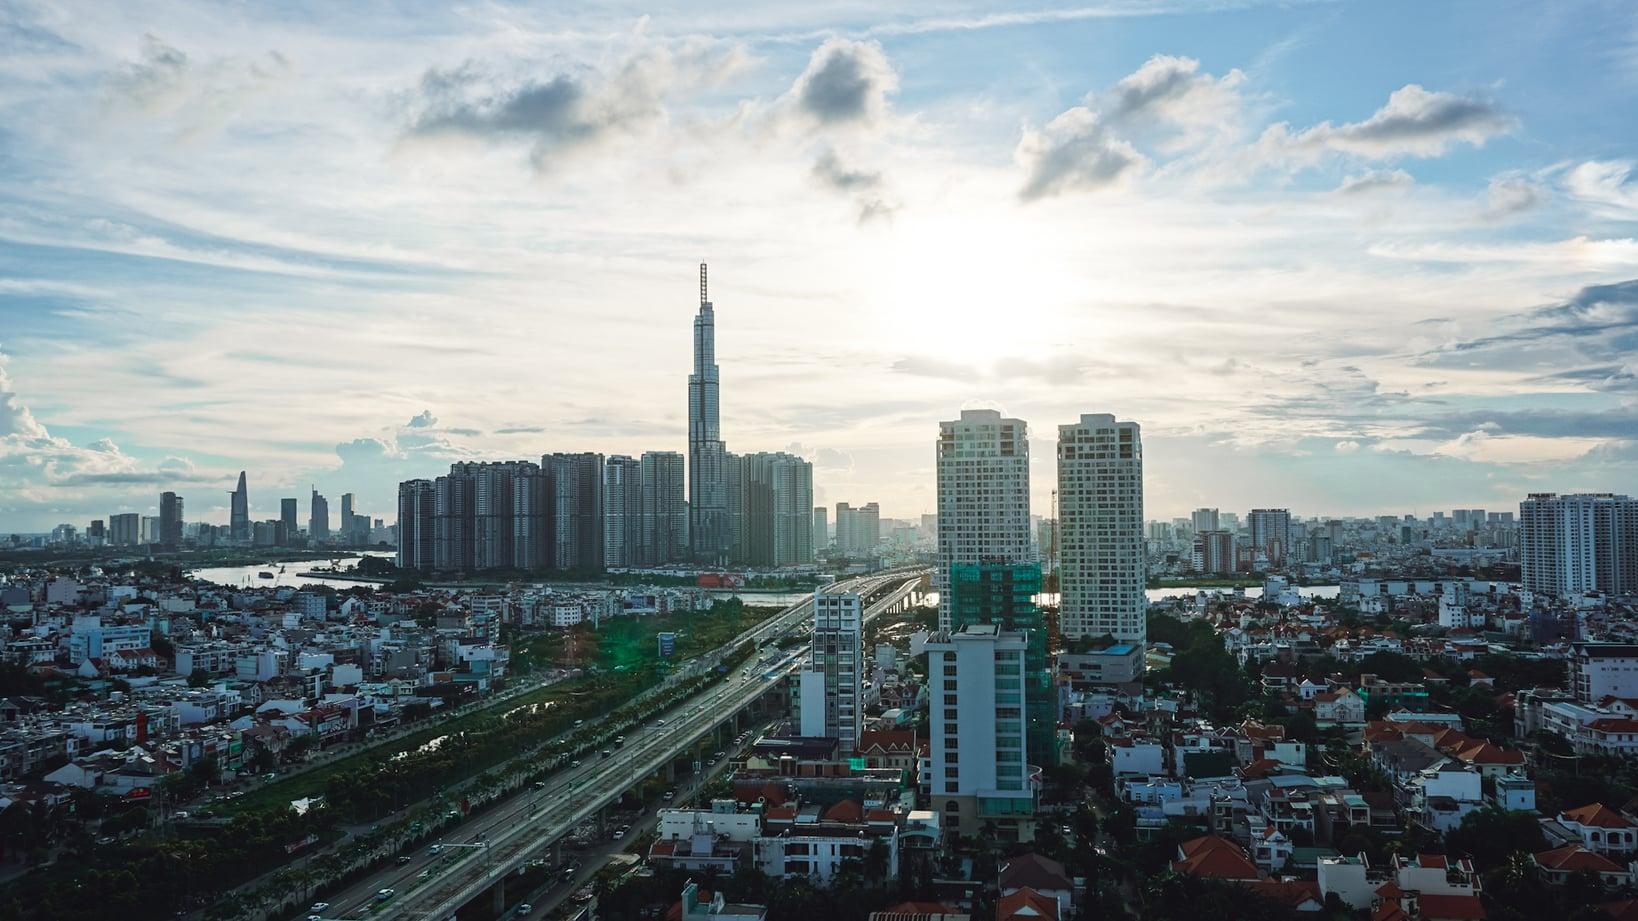 View of Ho Chi Minh City, Vietnam